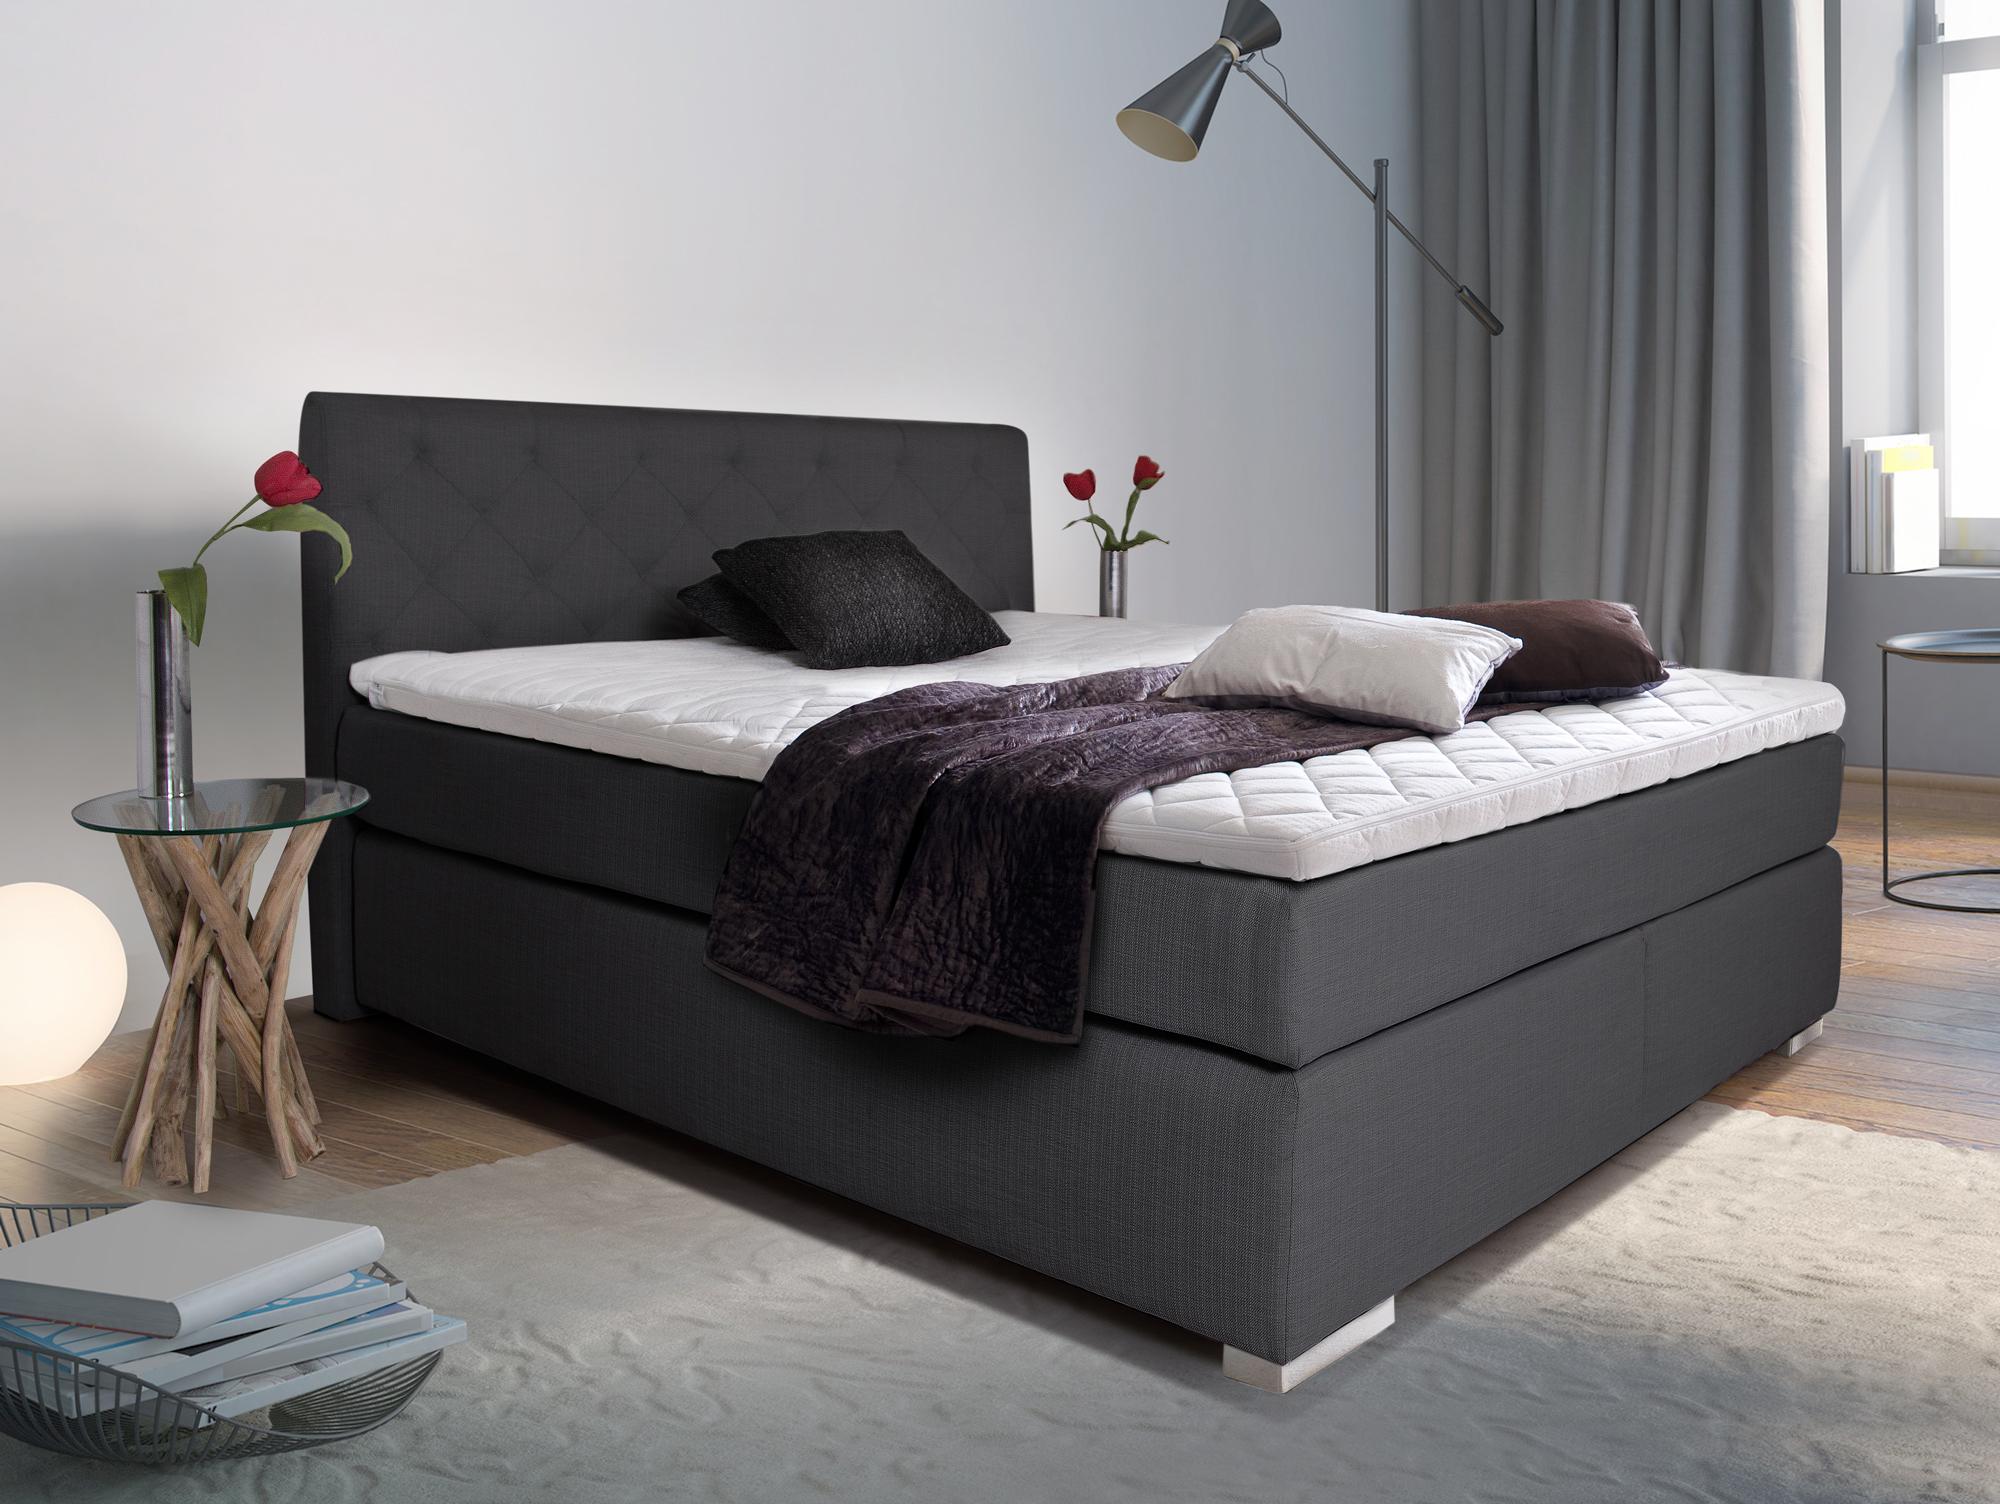 premium boxspringbett inkl kopfteil 180 x 200 cm anthrazit h rtegrad 3. Black Bedroom Furniture Sets. Home Design Ideas